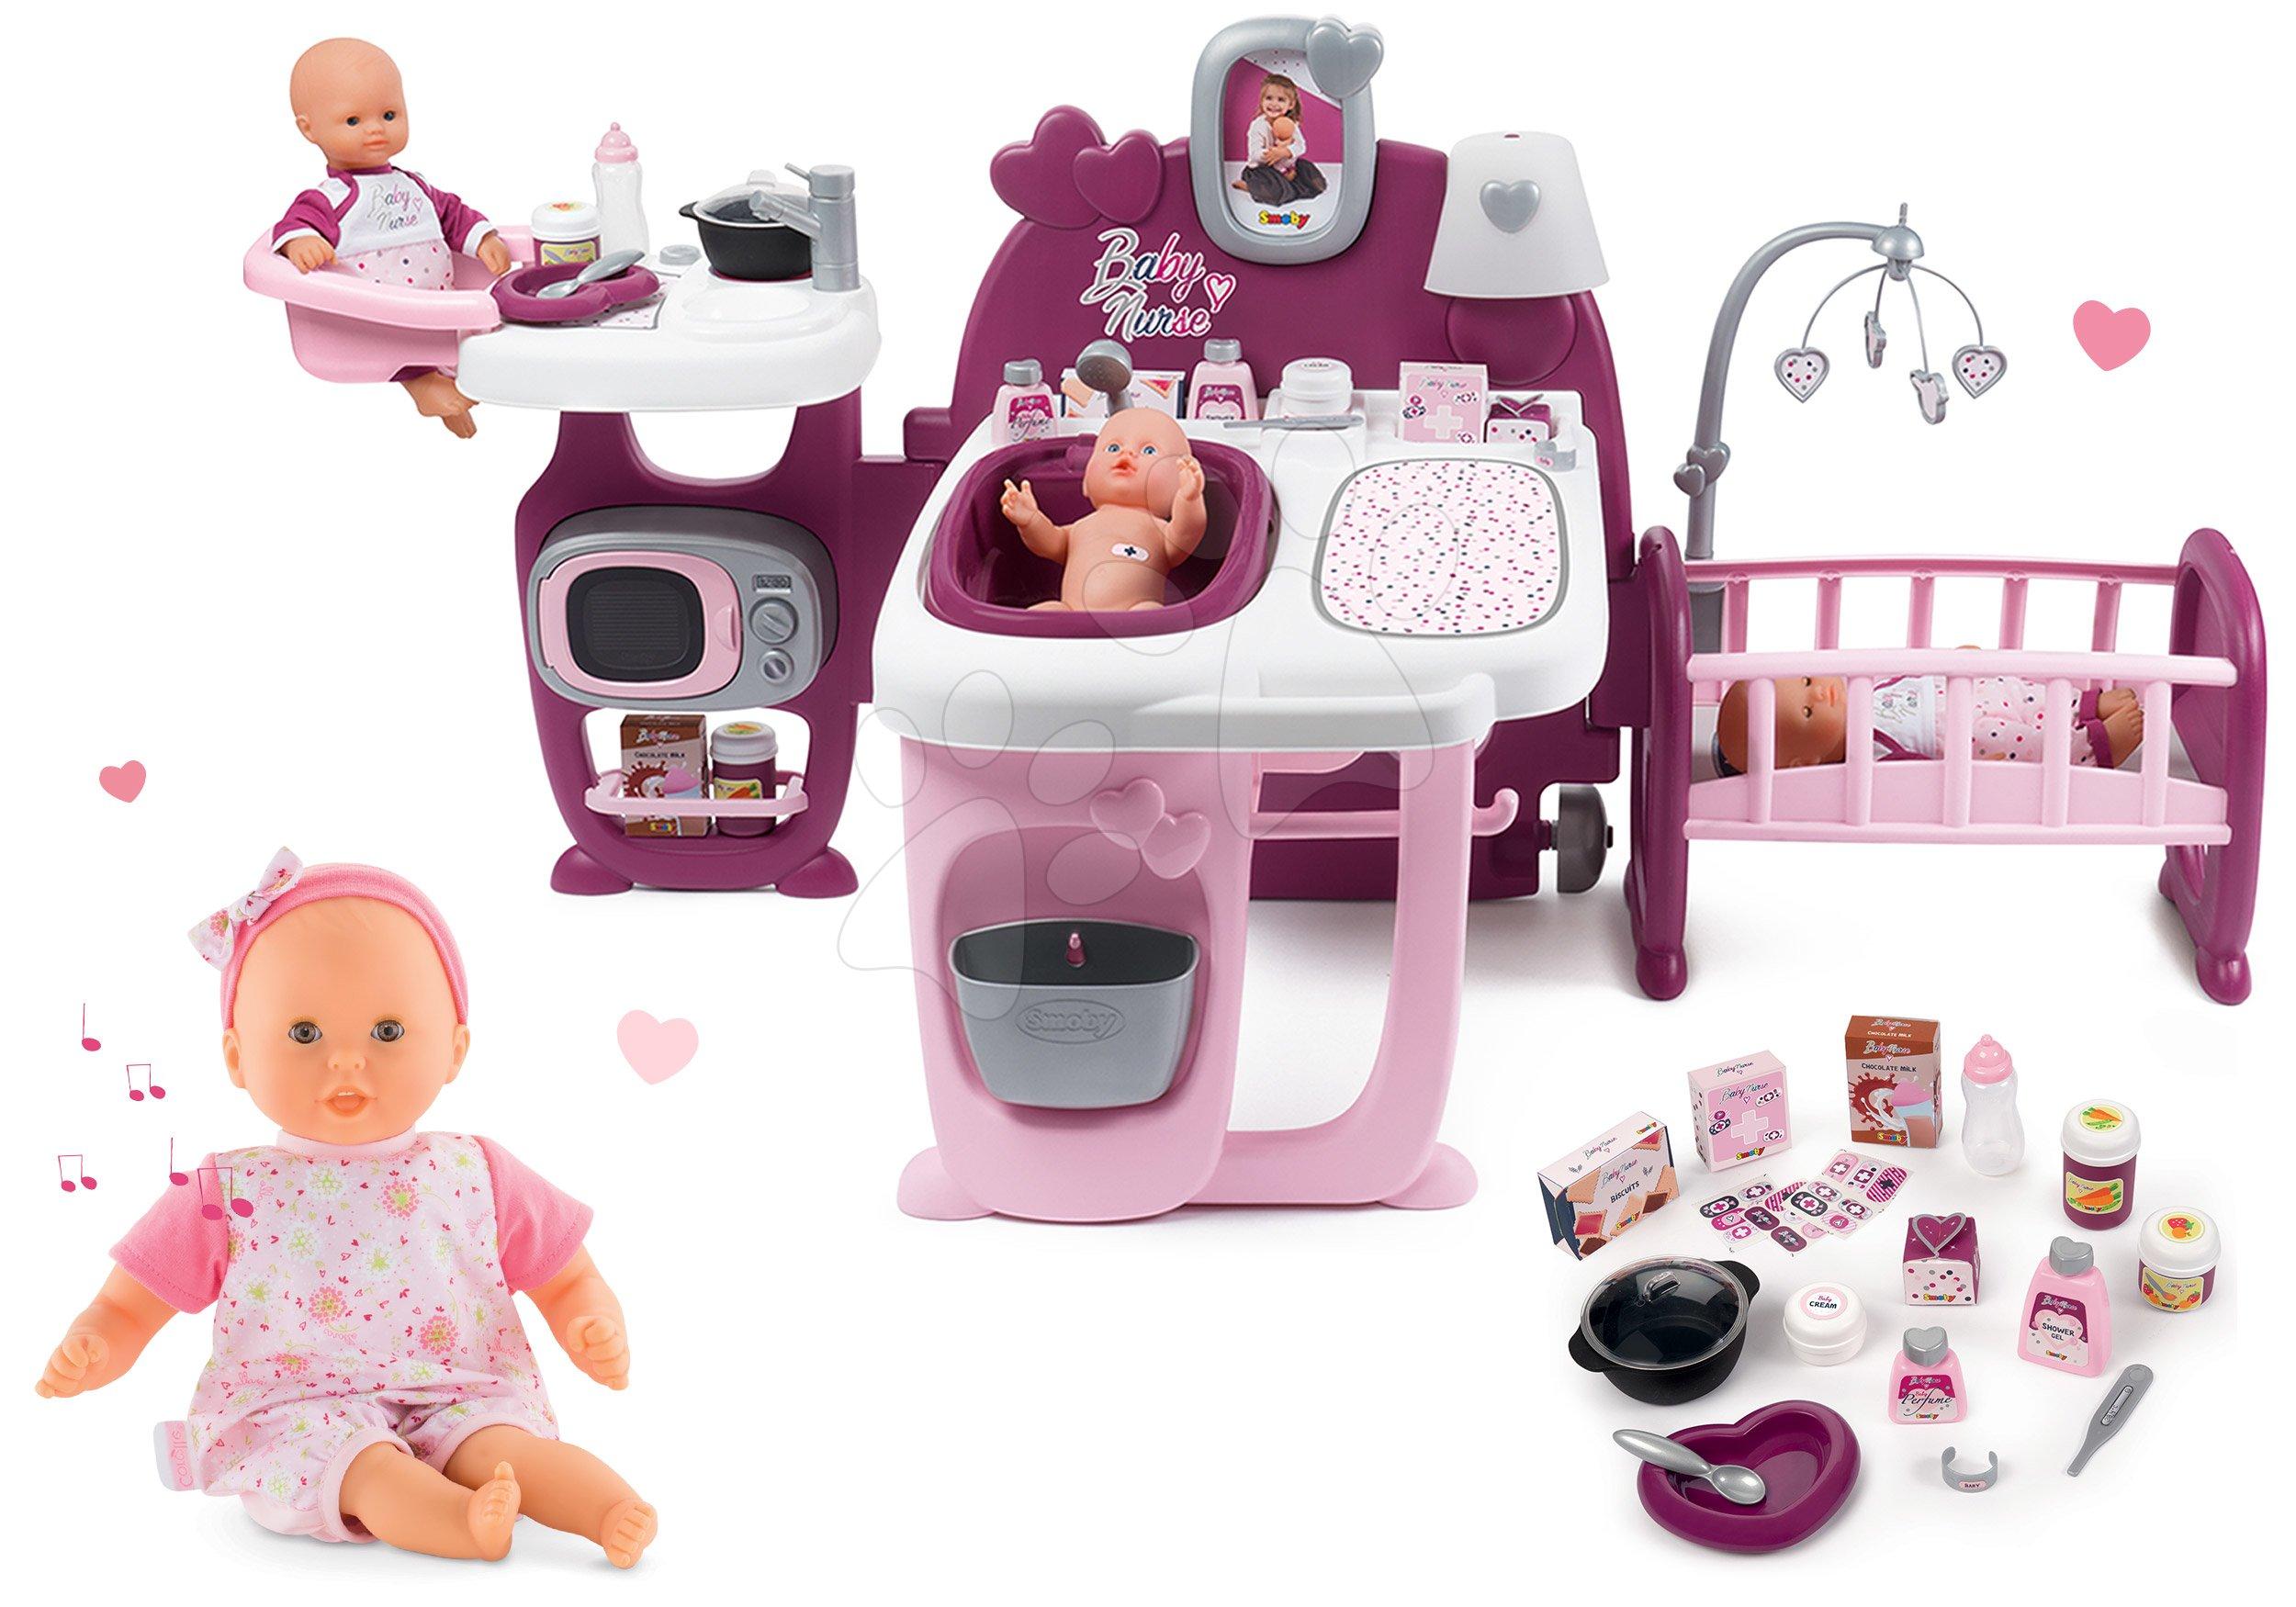 Set centru bebe Violette Baby Nurse Large Doll's Play Center Smoby și păpușă interactivă Bébé Calin Loving & Melodies cu 4 sunete și 3 melodii 30 cm